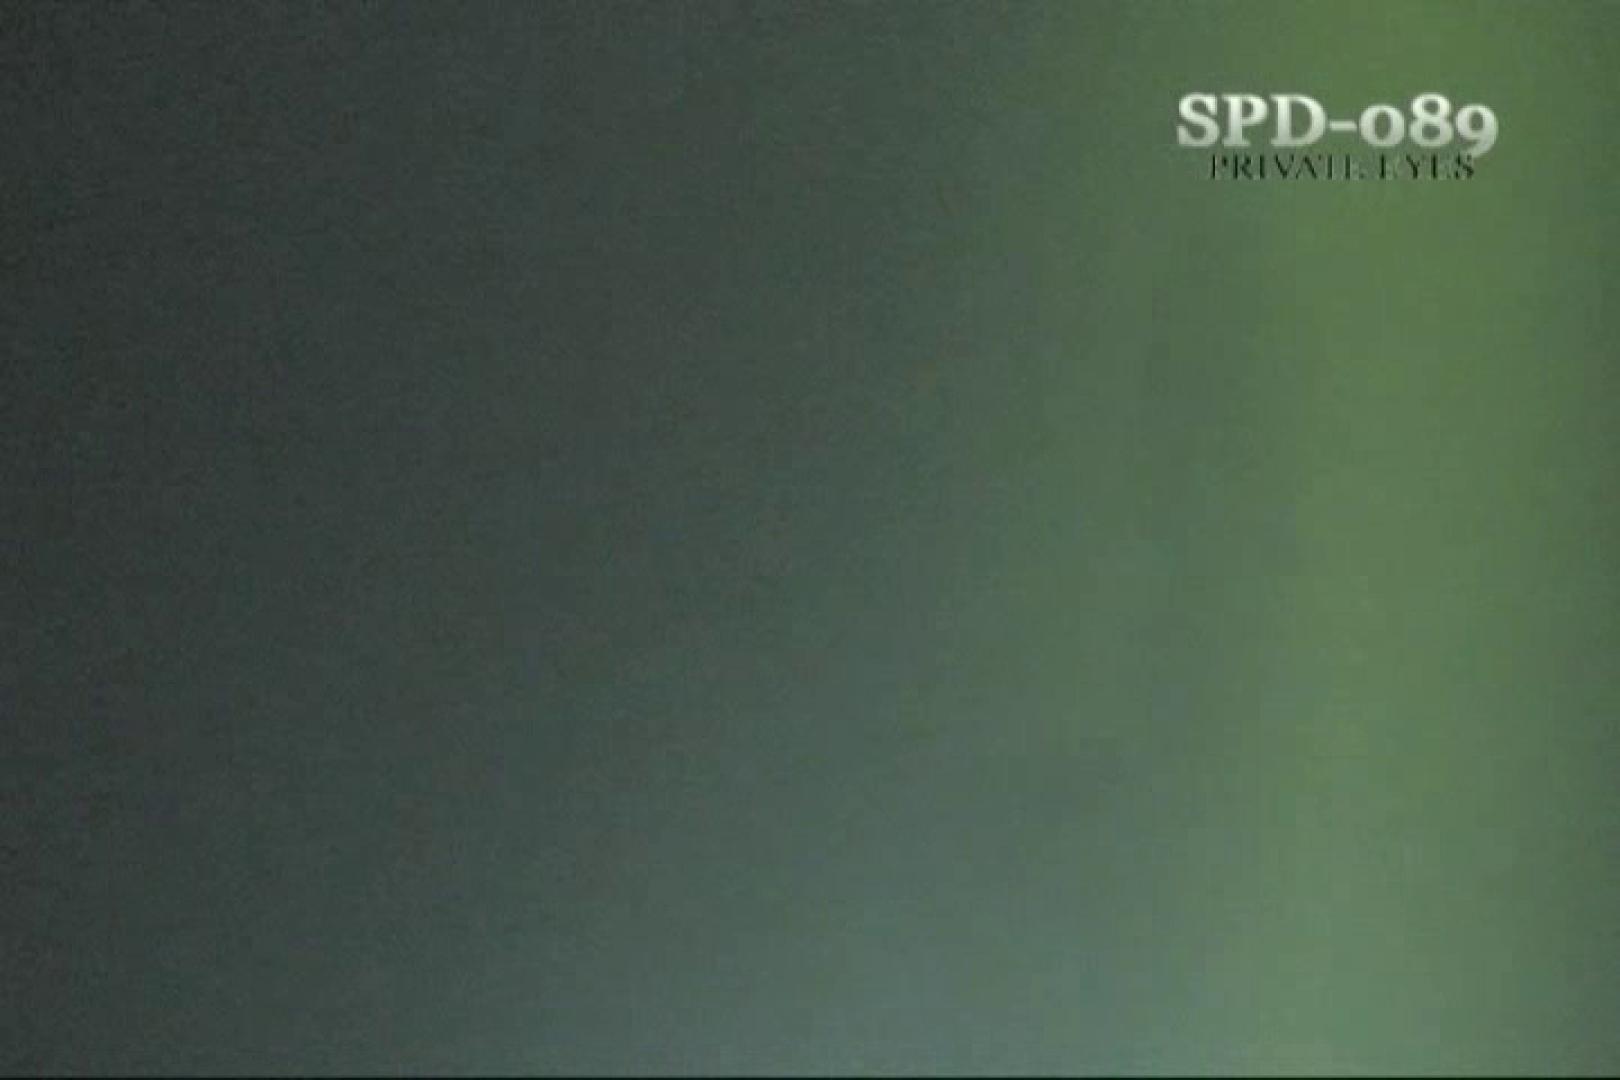 高画質版!SPD-089 厠の隙間 4 厠 濡れ場動画紹介 11pic 2